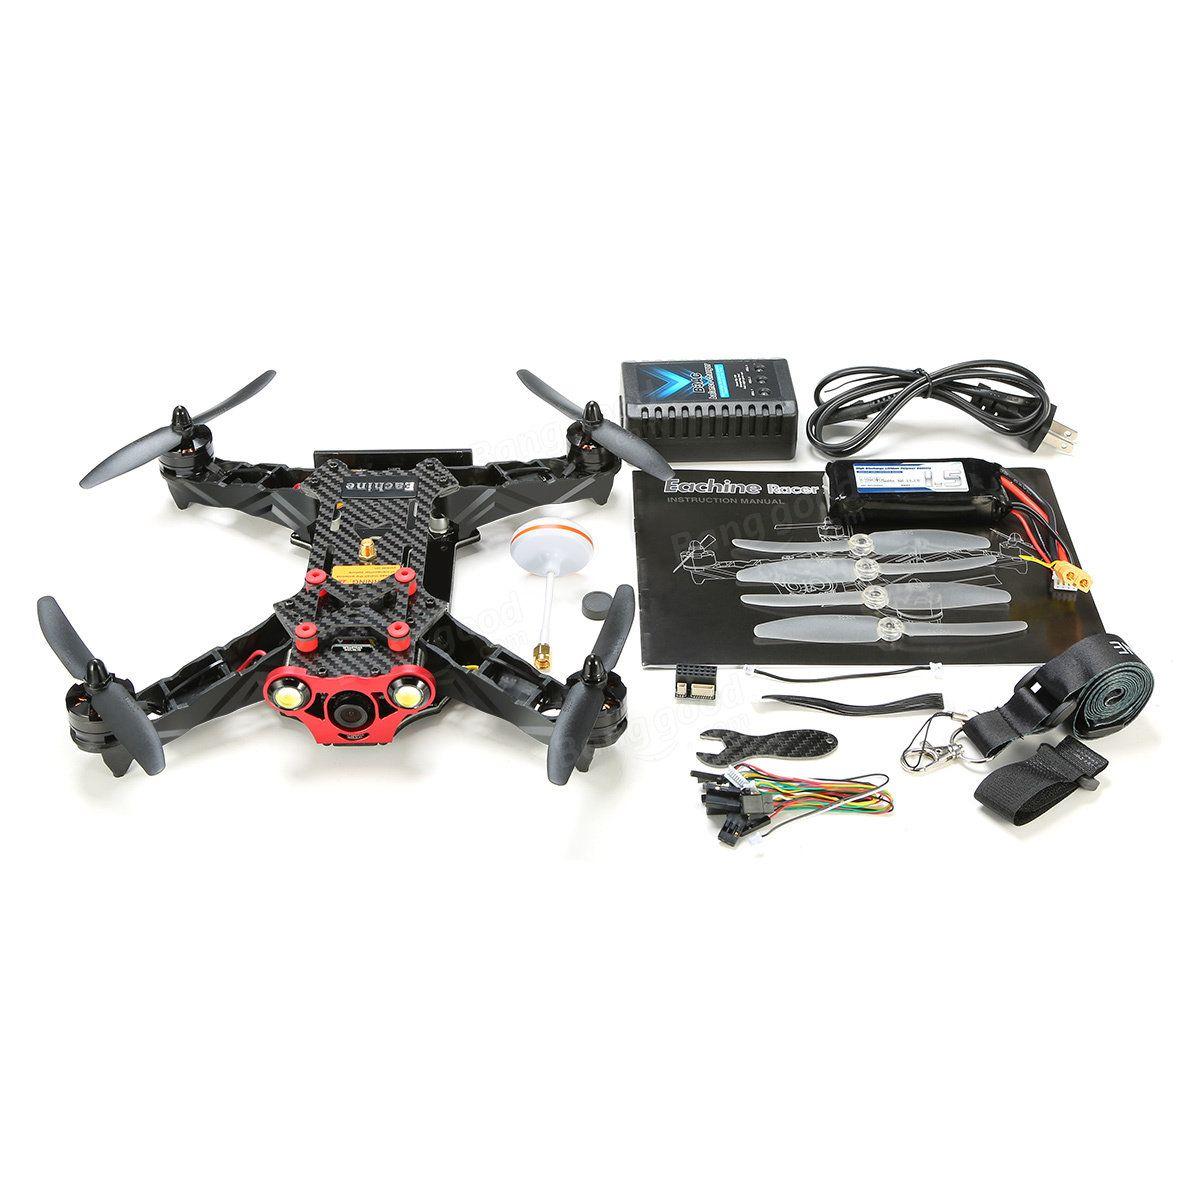 Eachine Racer 250 FPV Drone gebaut 5.8G Sender OSD Mit HD Kamera ARF ...